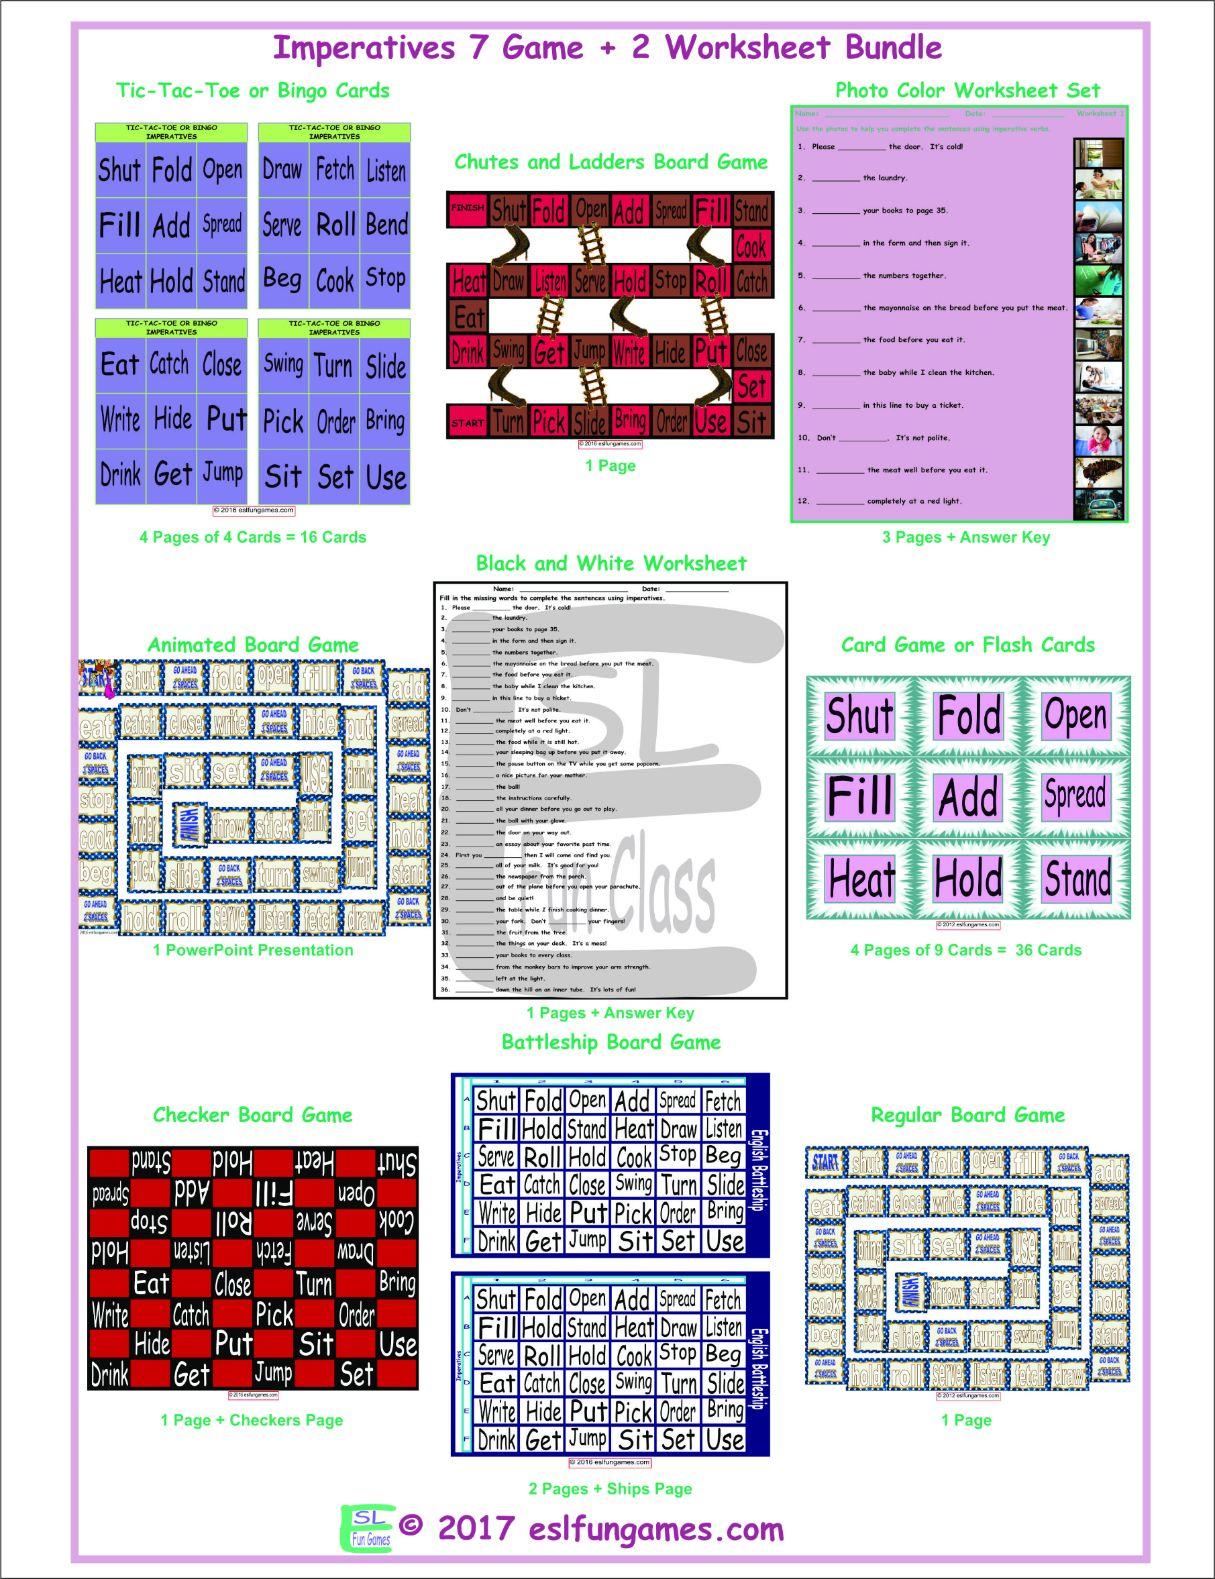 Imperatives 7 Game Plus 2 Worksheet Bundle